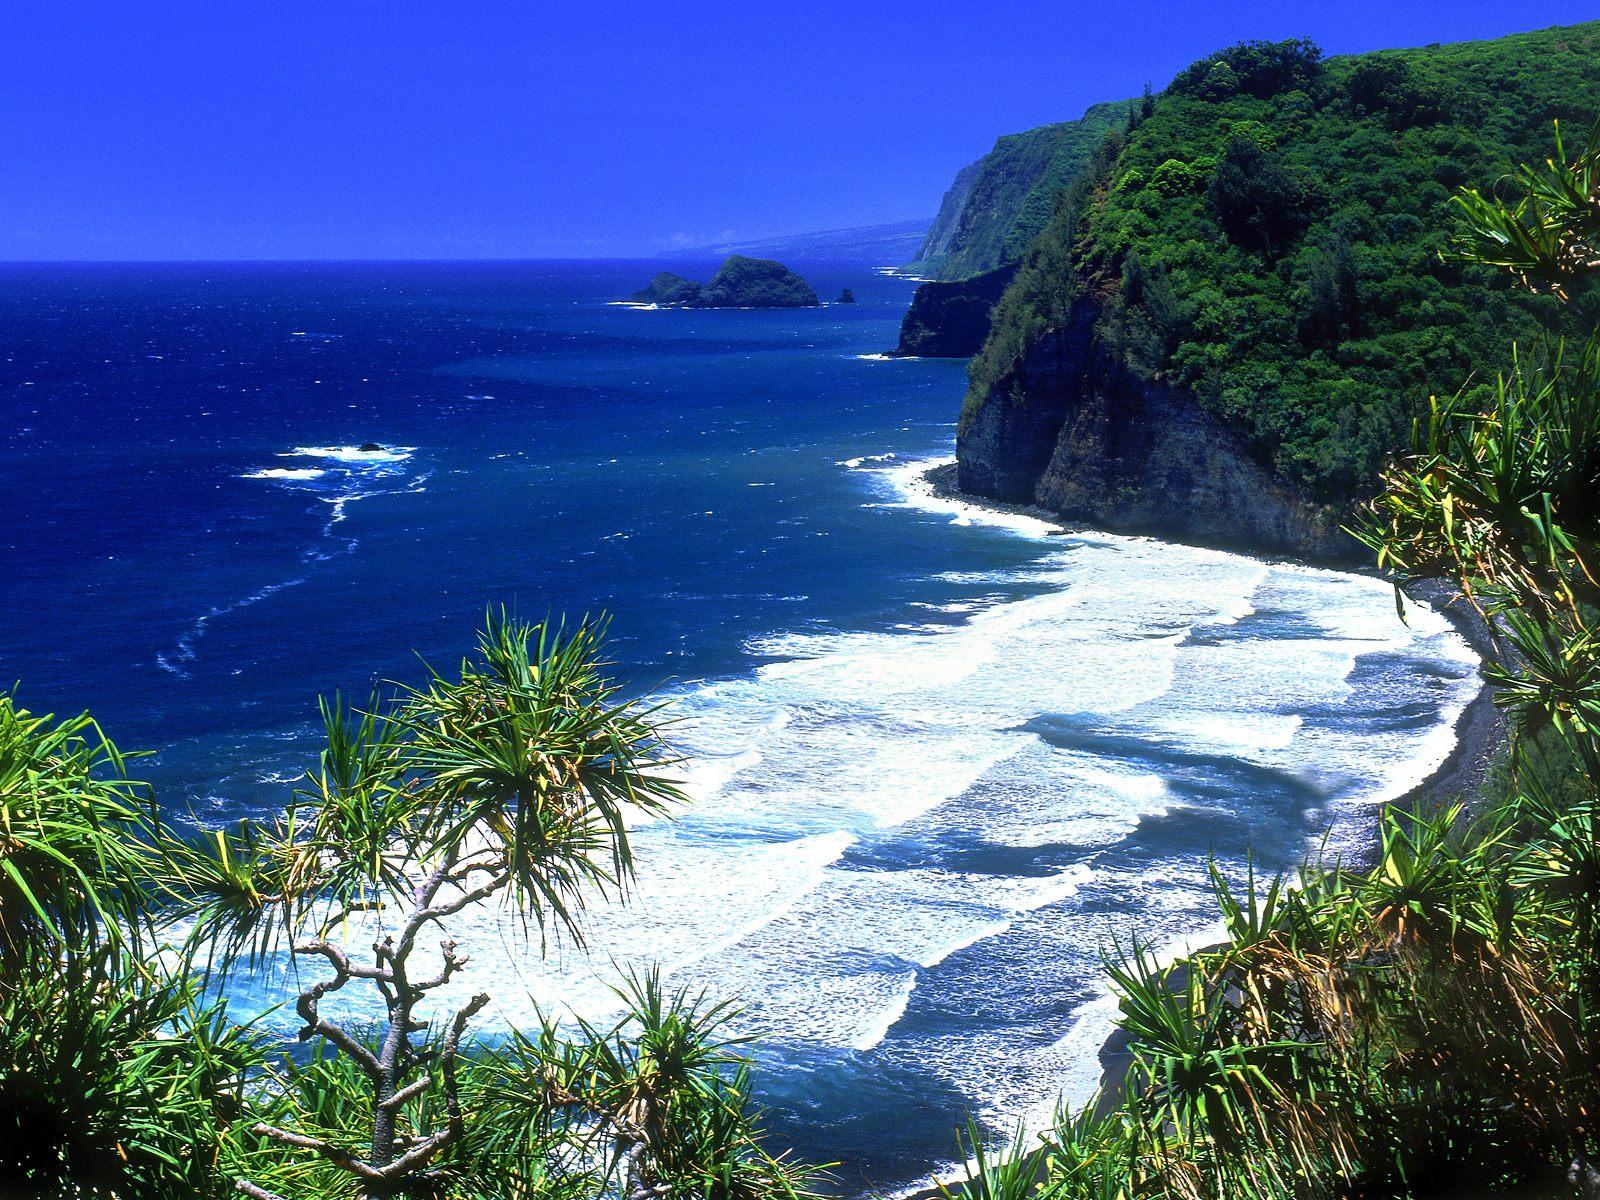 Amazing Bing Images Beautiful Beaches Detail Photo 1600x1200